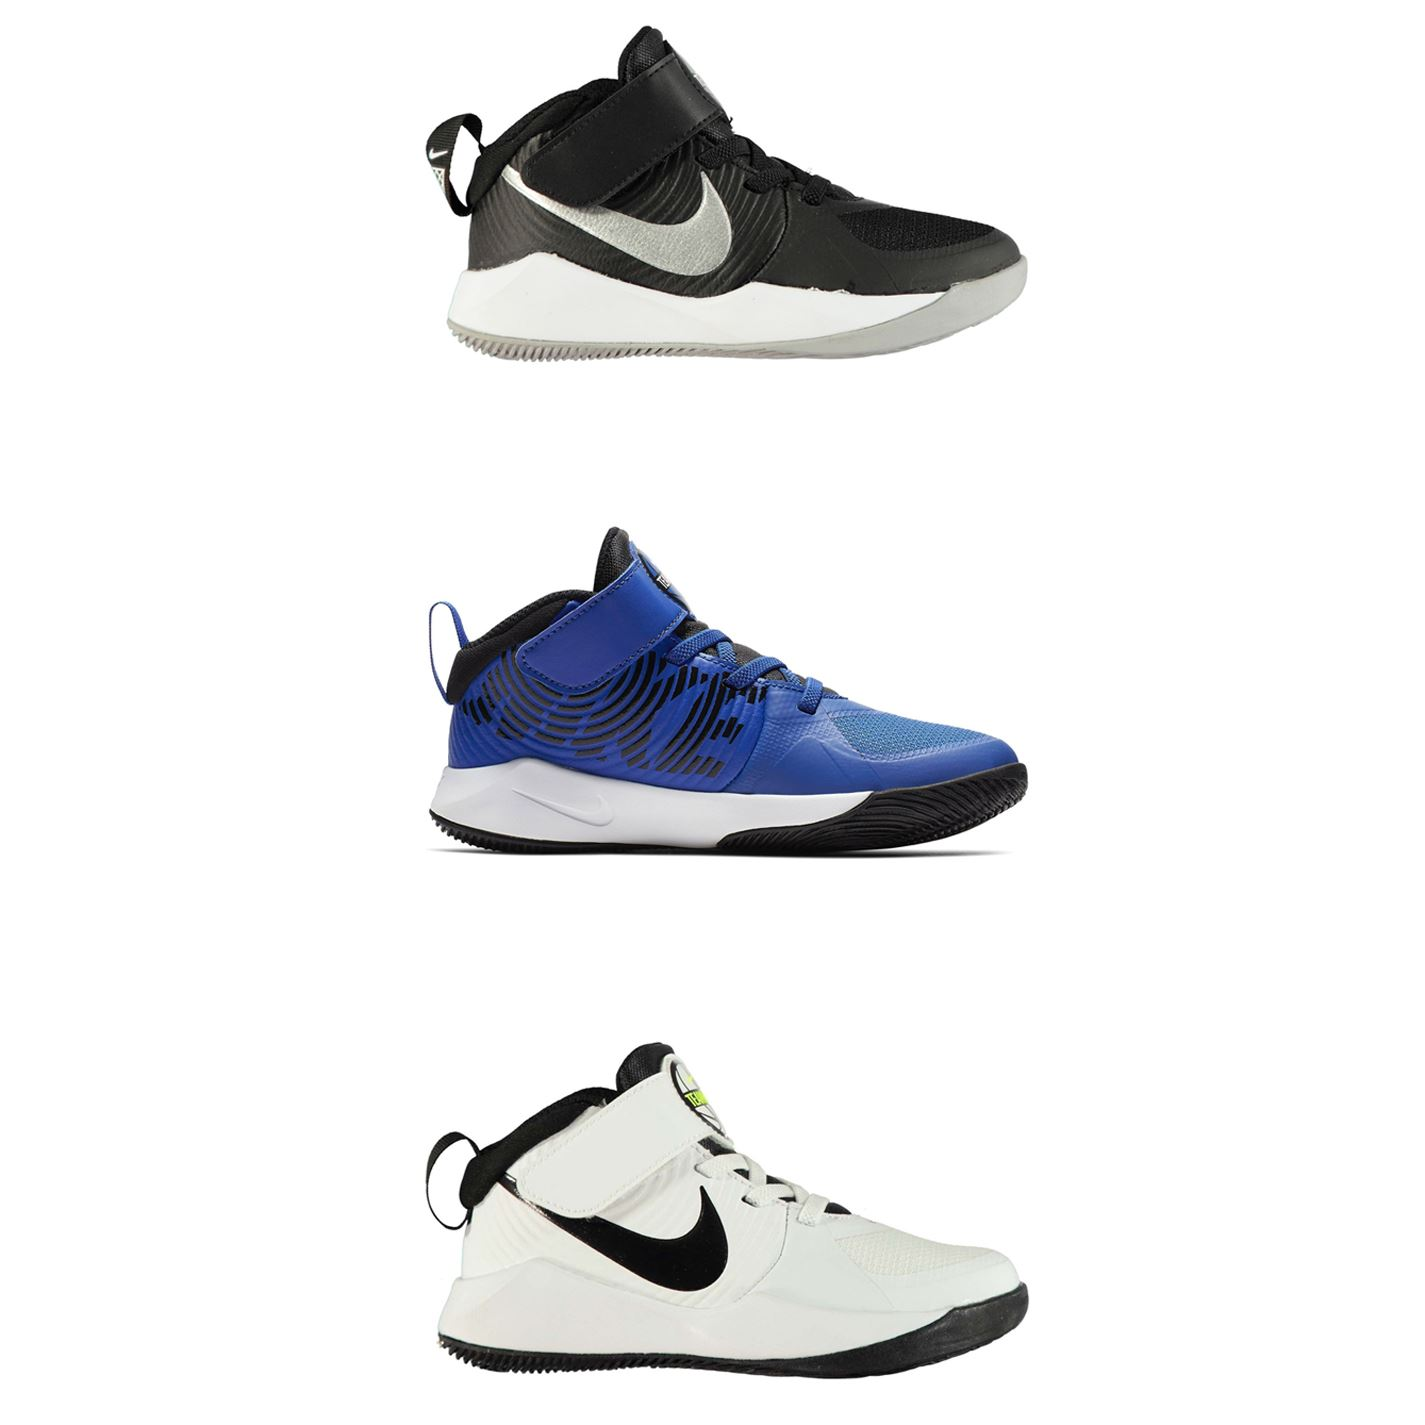 Nike Team Hustle D9 Basketball Shoe Kids' Kids Shoes   DSW